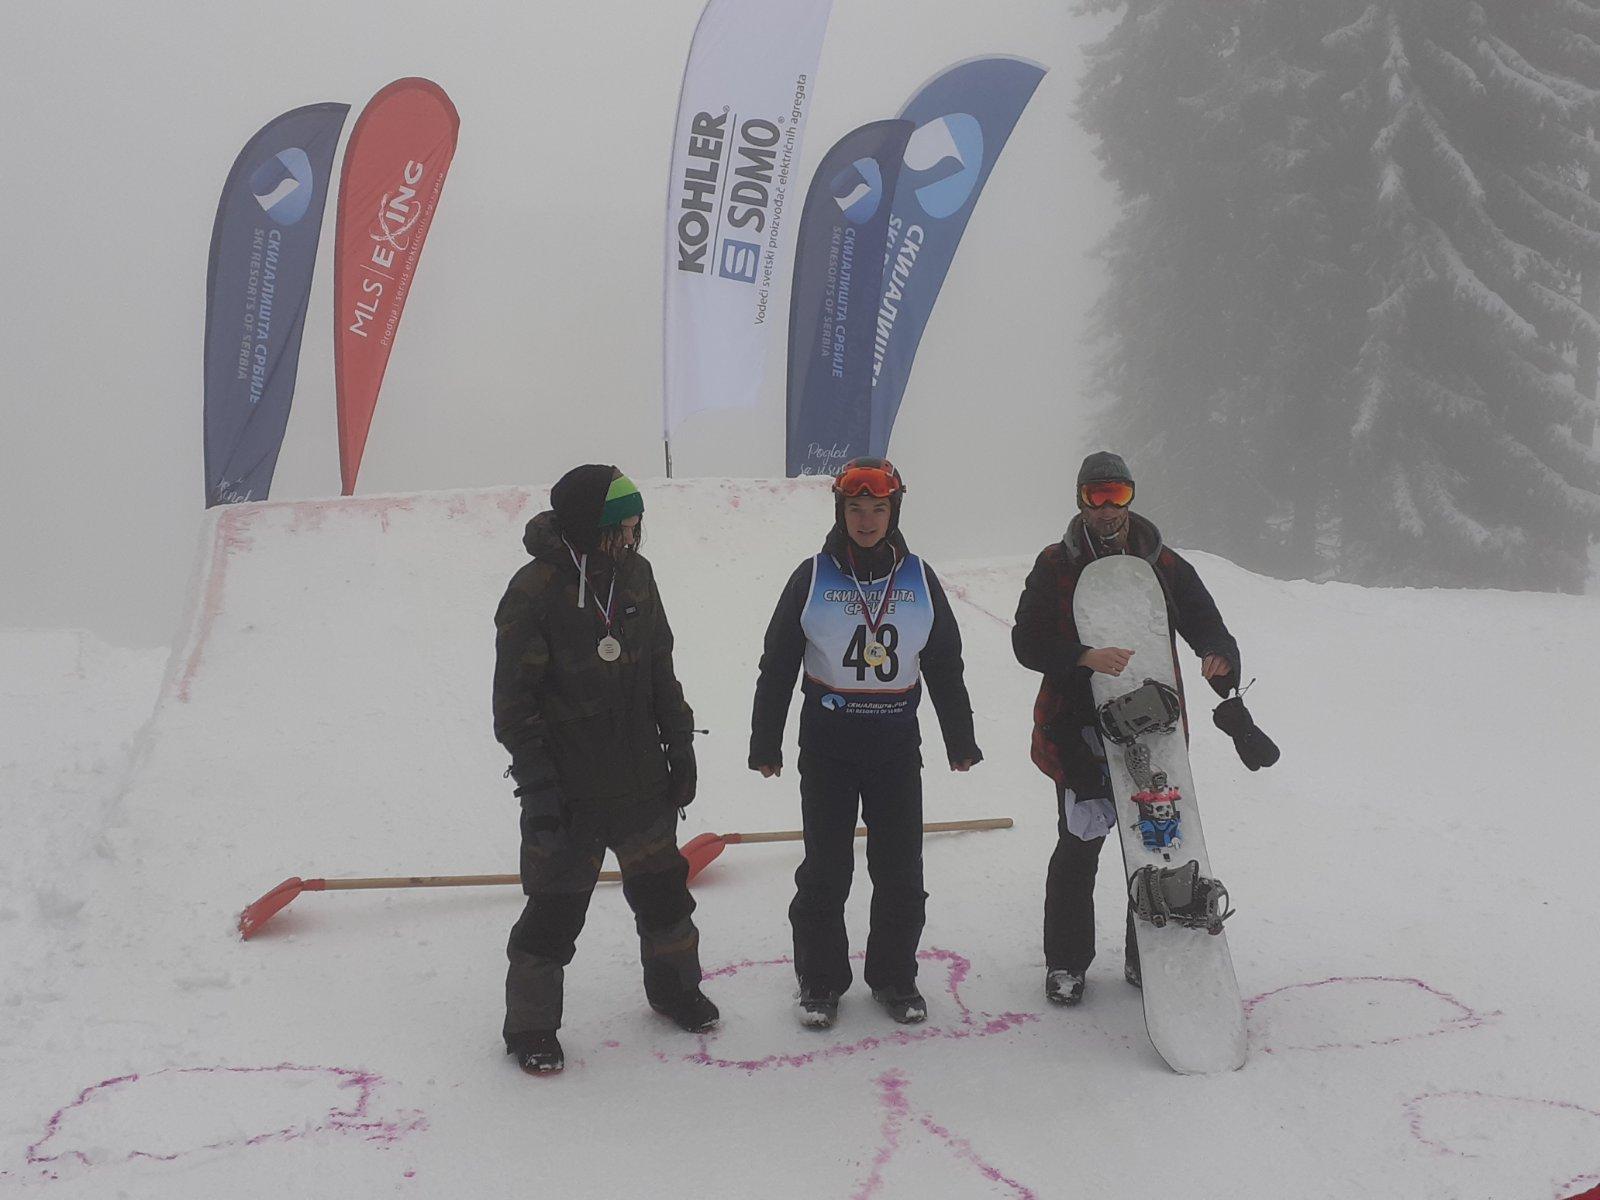 "Photo of Snouborderi iz Ski i snoubord kluba ""Stara planina"" uspešni na Kopaonicu na ABC kupu"